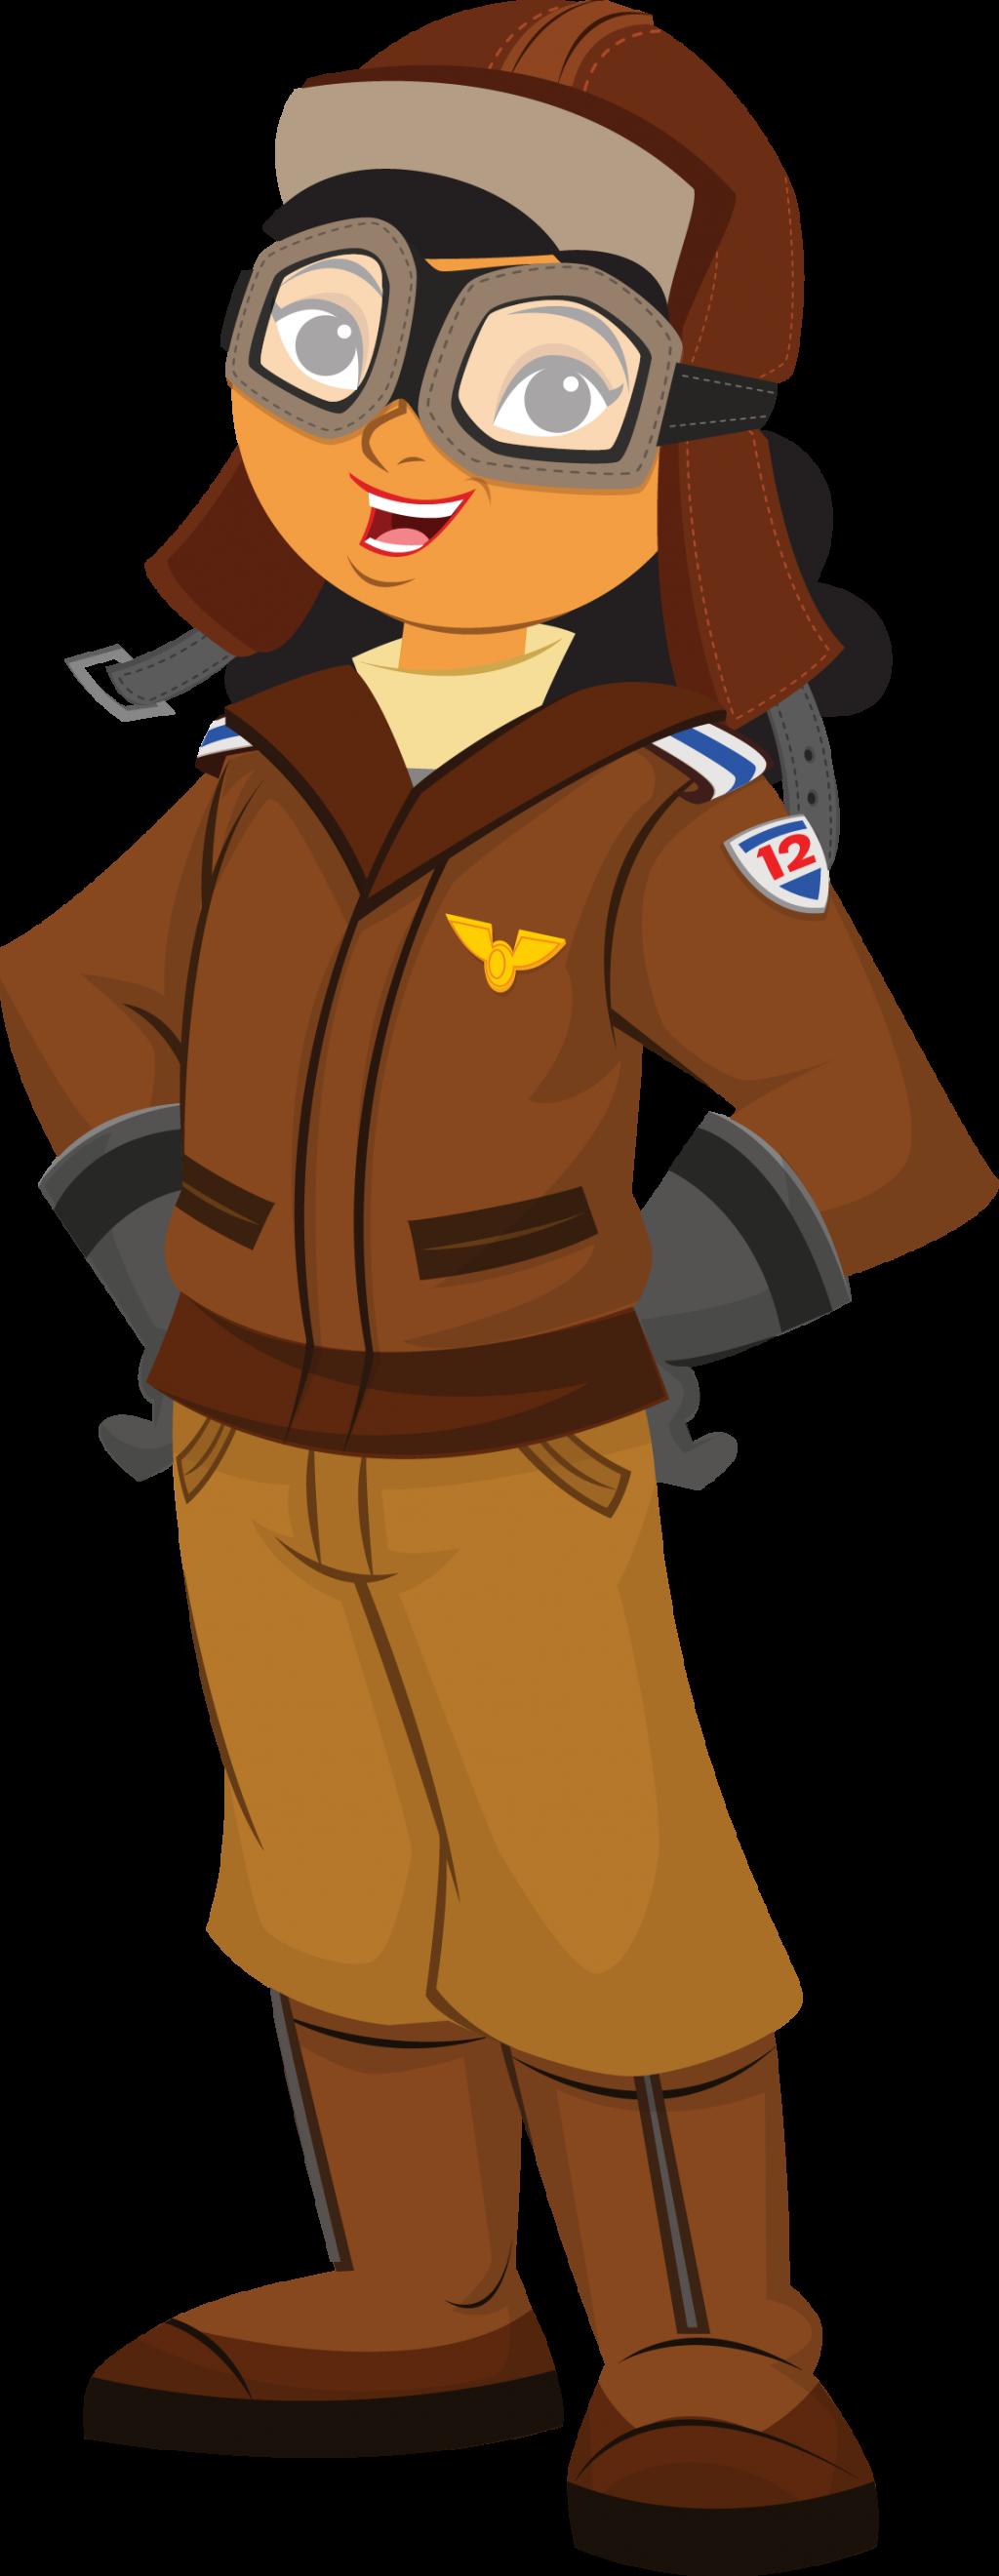 Pilot clipart air force pilot, Pilot air force pilot.